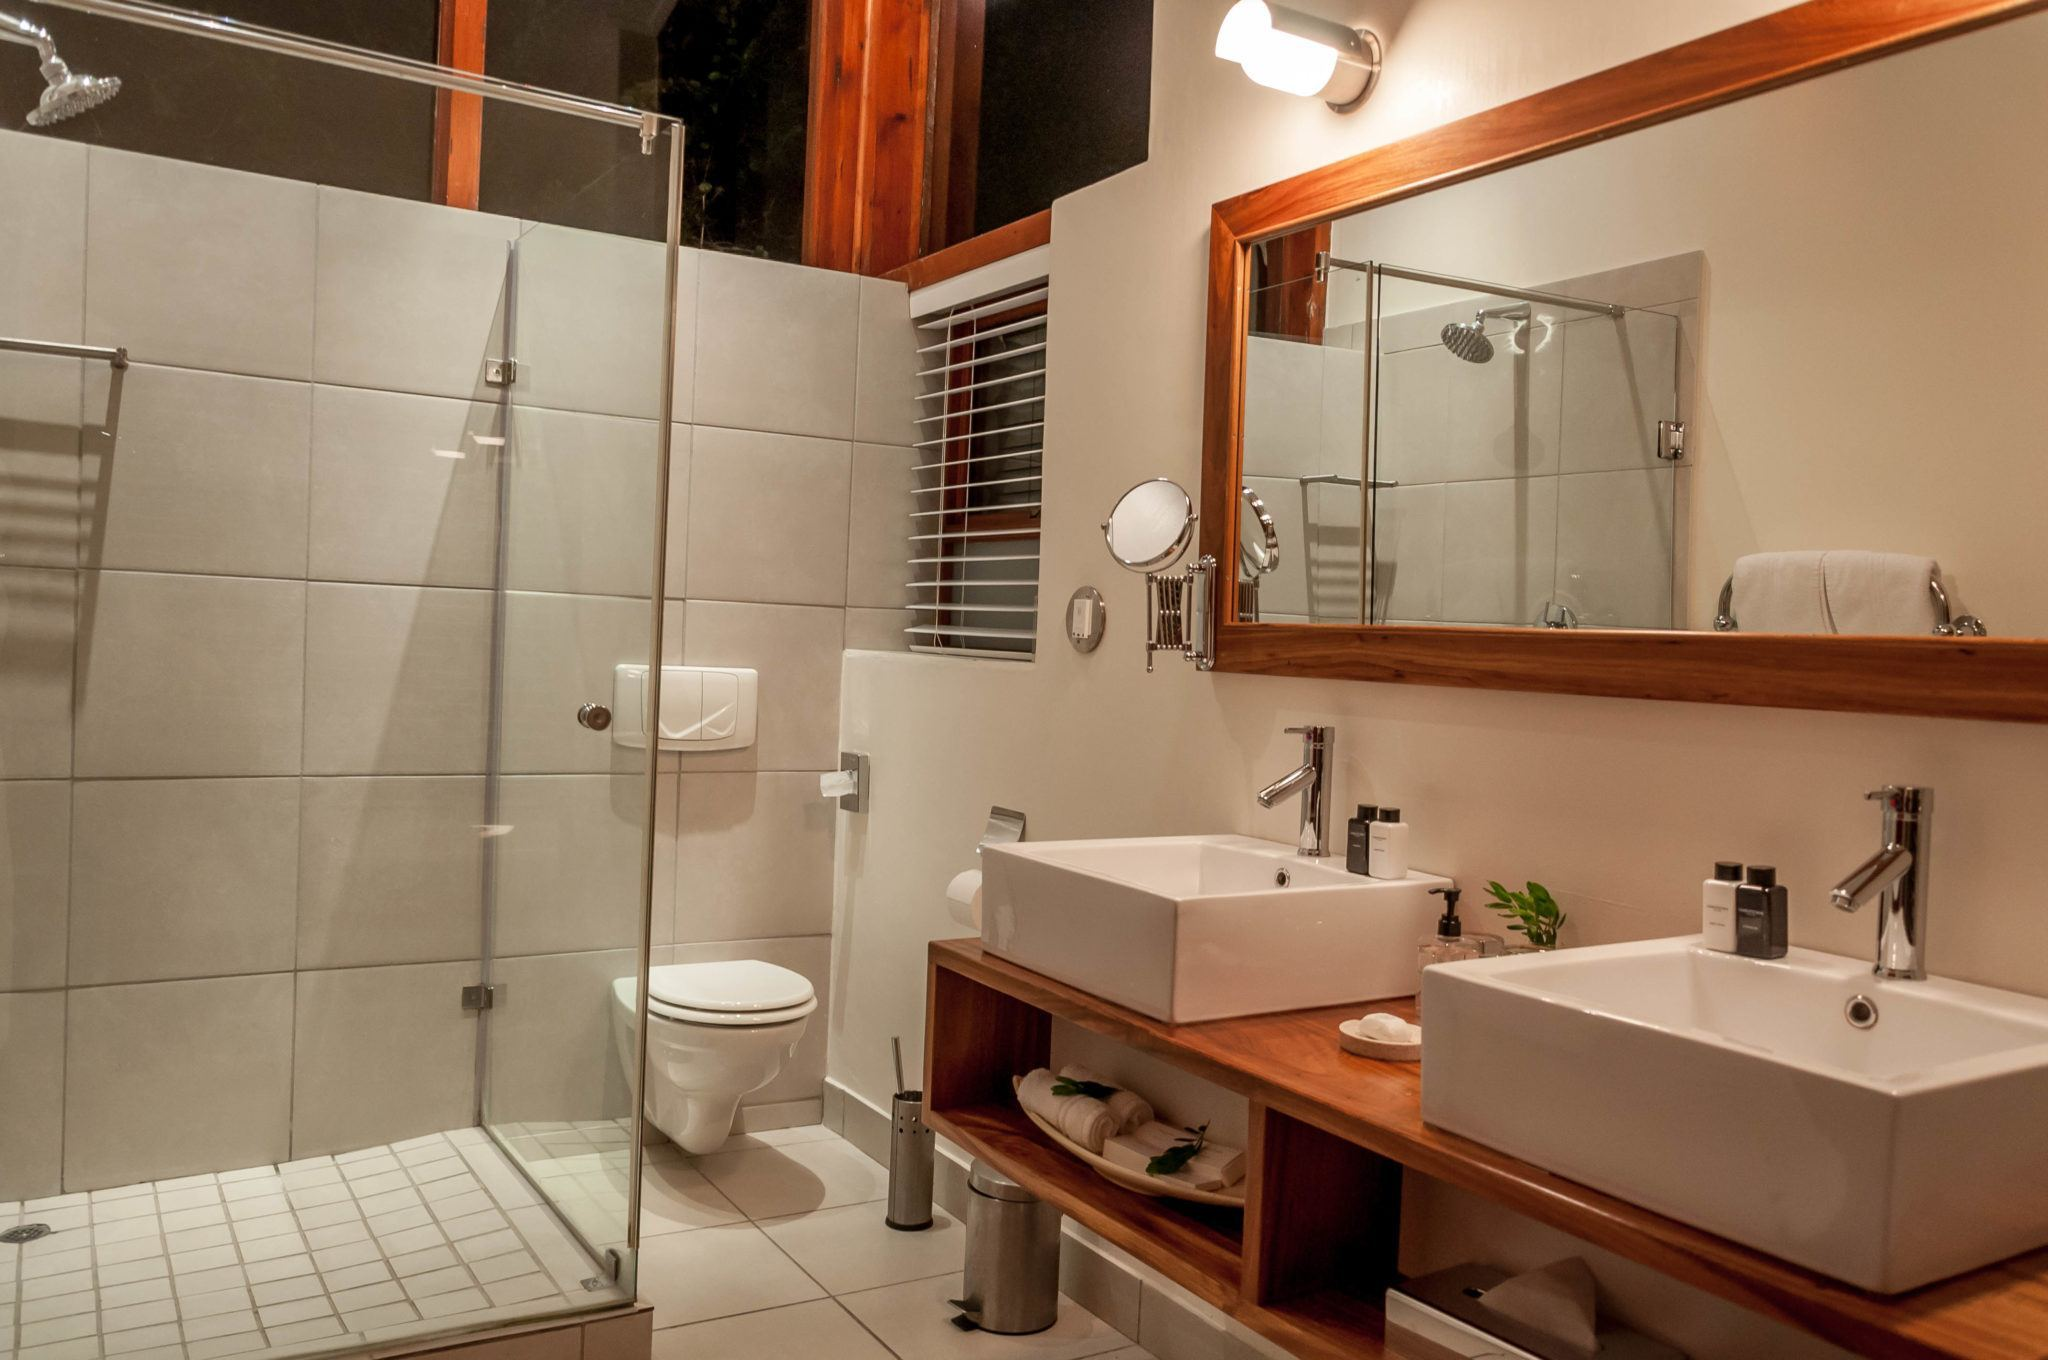 The bathroom in the luxury suites